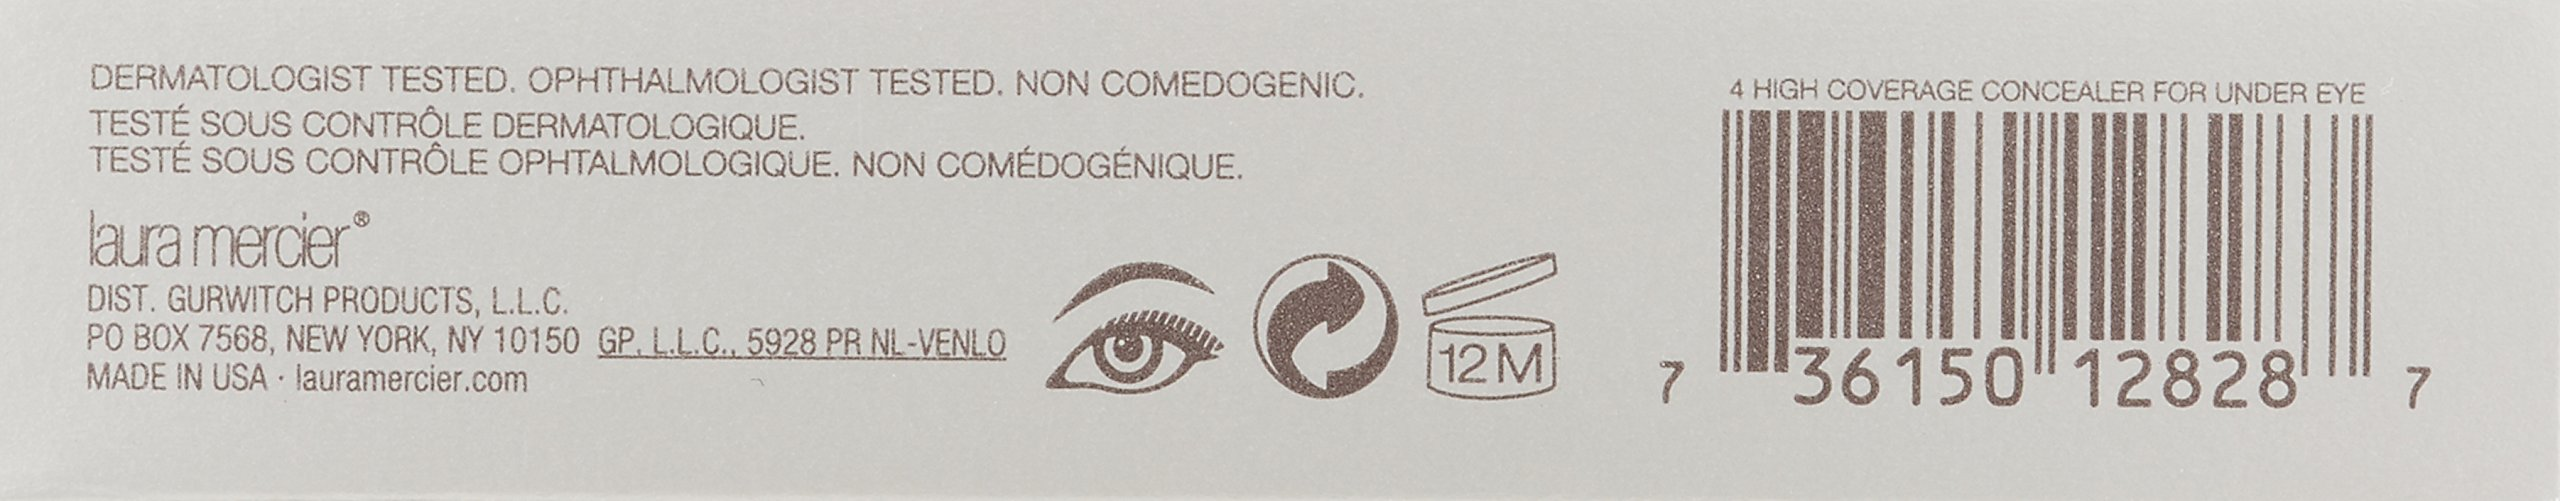 Laura Mercier High Coverage Concealer for Under Eye, No. 4, 0.27 Ounce by laura mercier (Image #2)